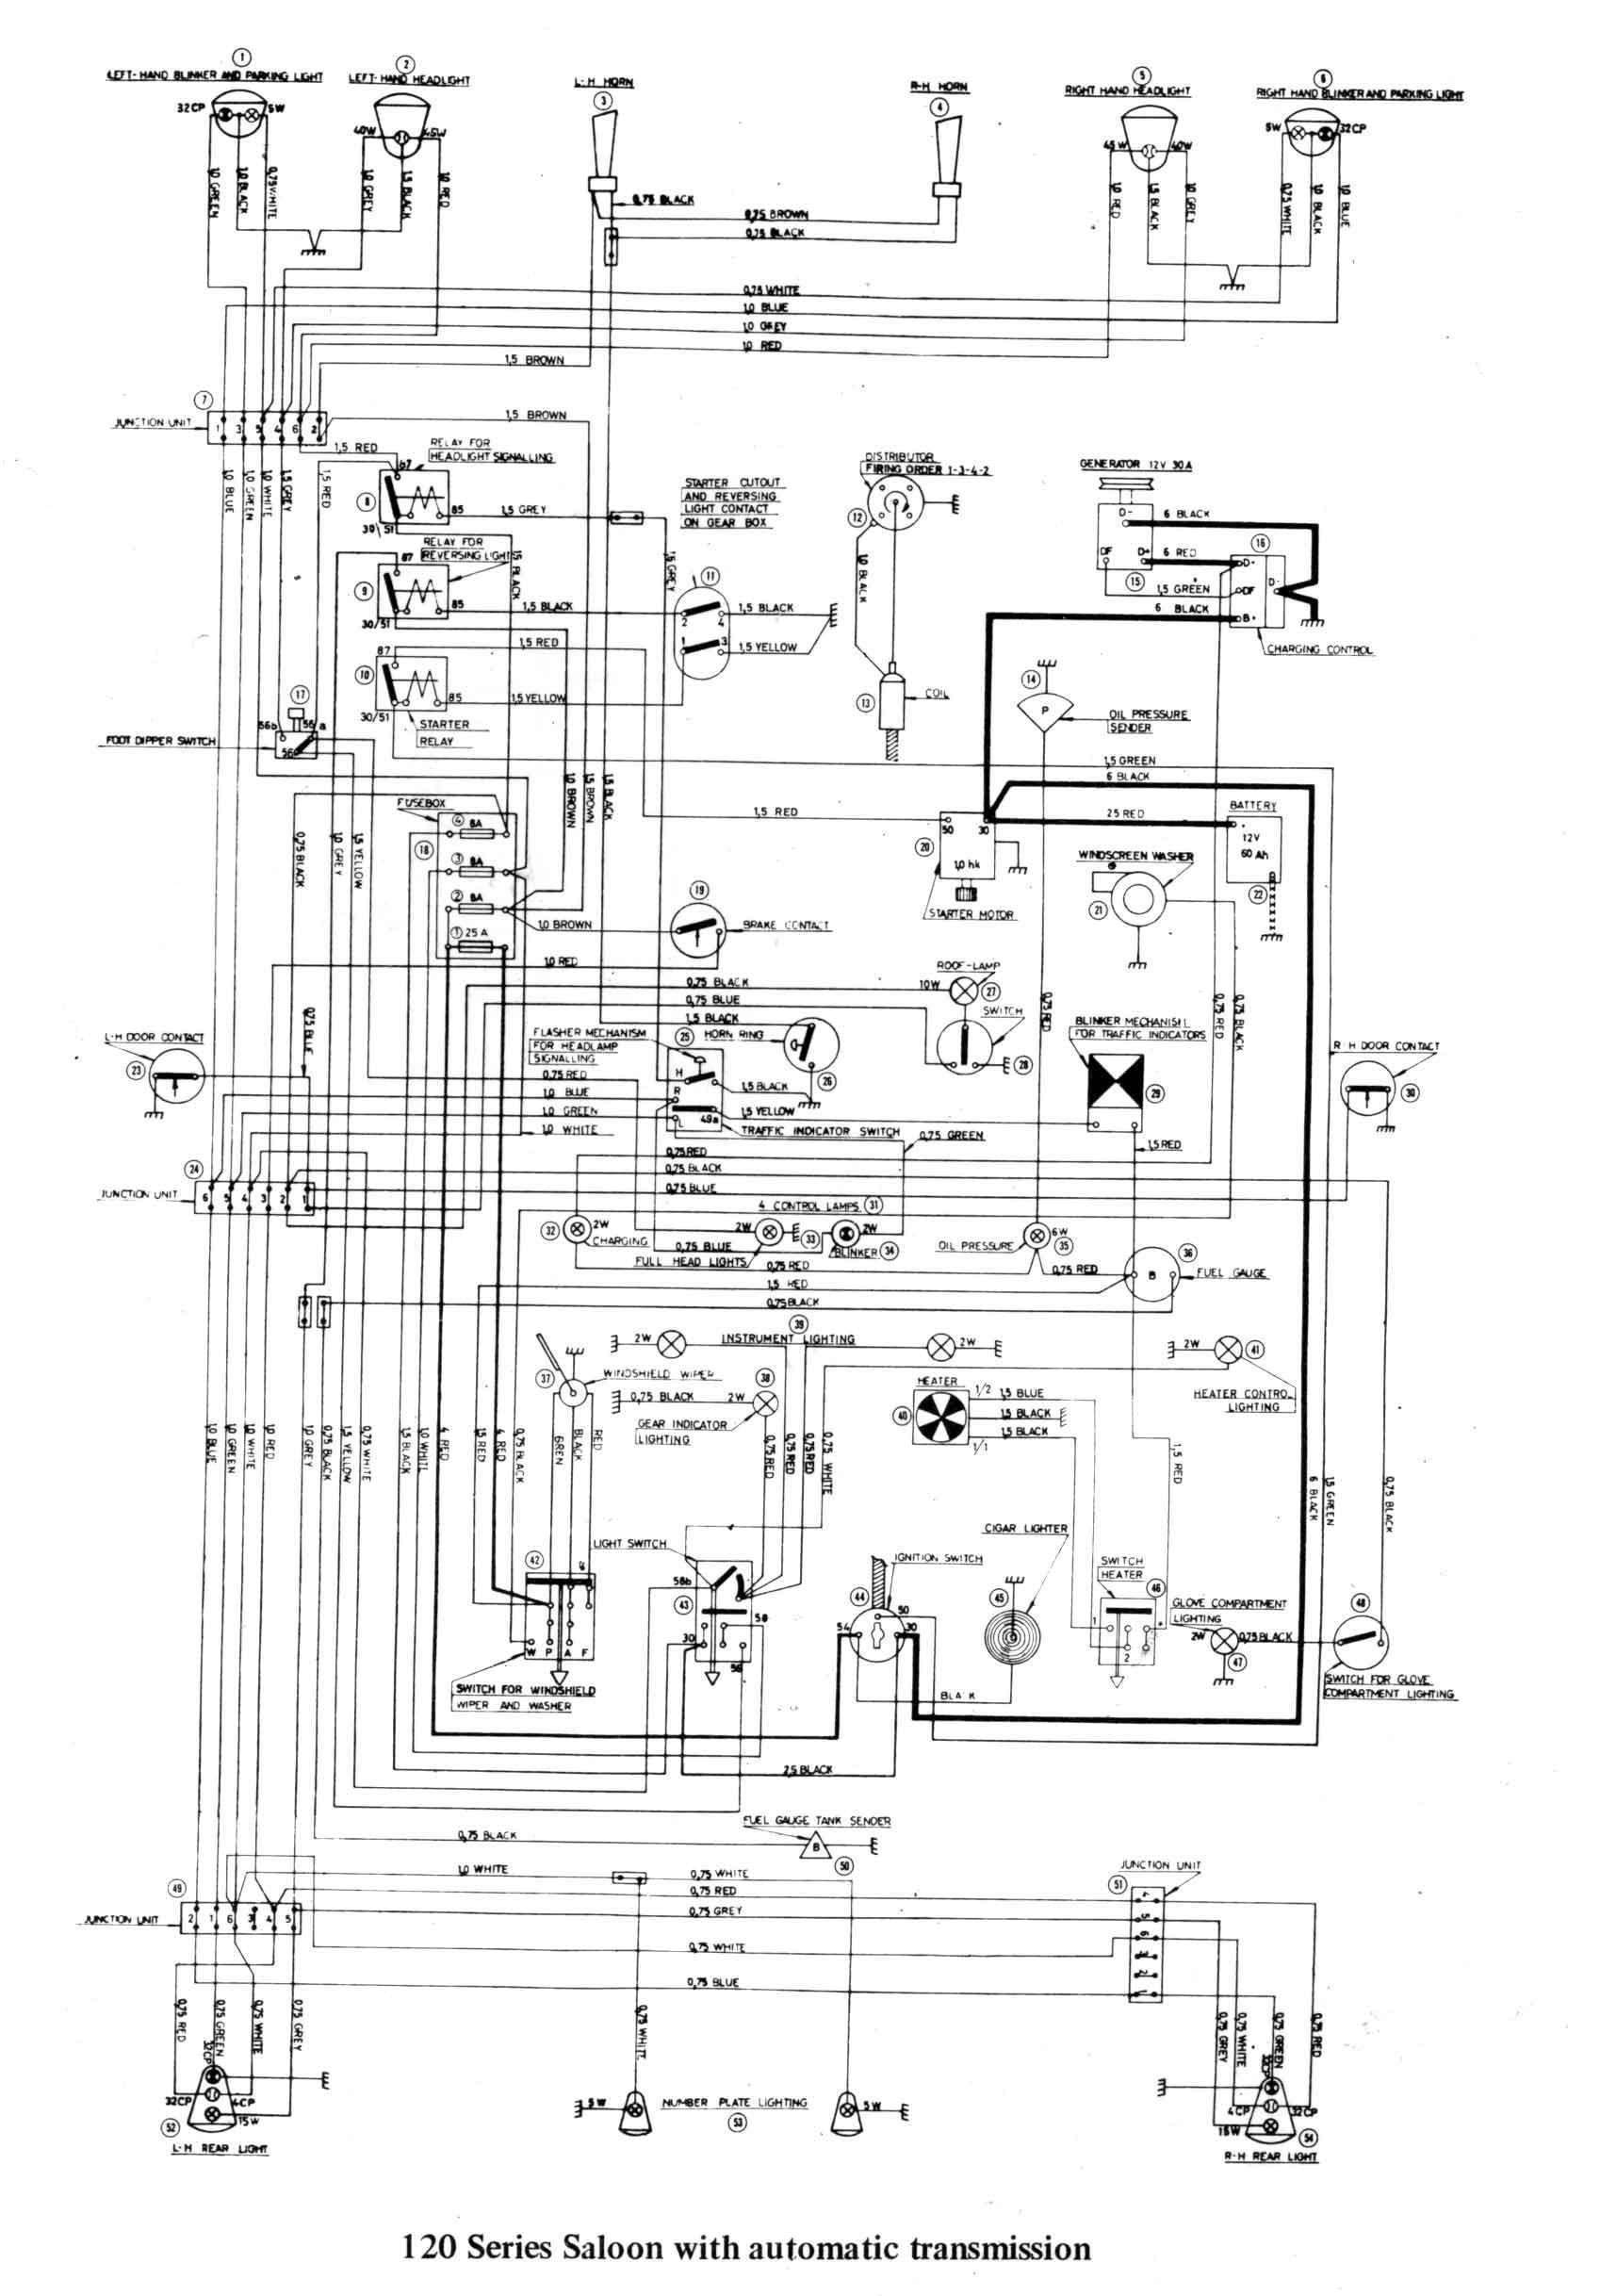 hight resolution of wrg 1641 359 peterbilt wiring diagram peterbilt 359 headlight wiring diagram